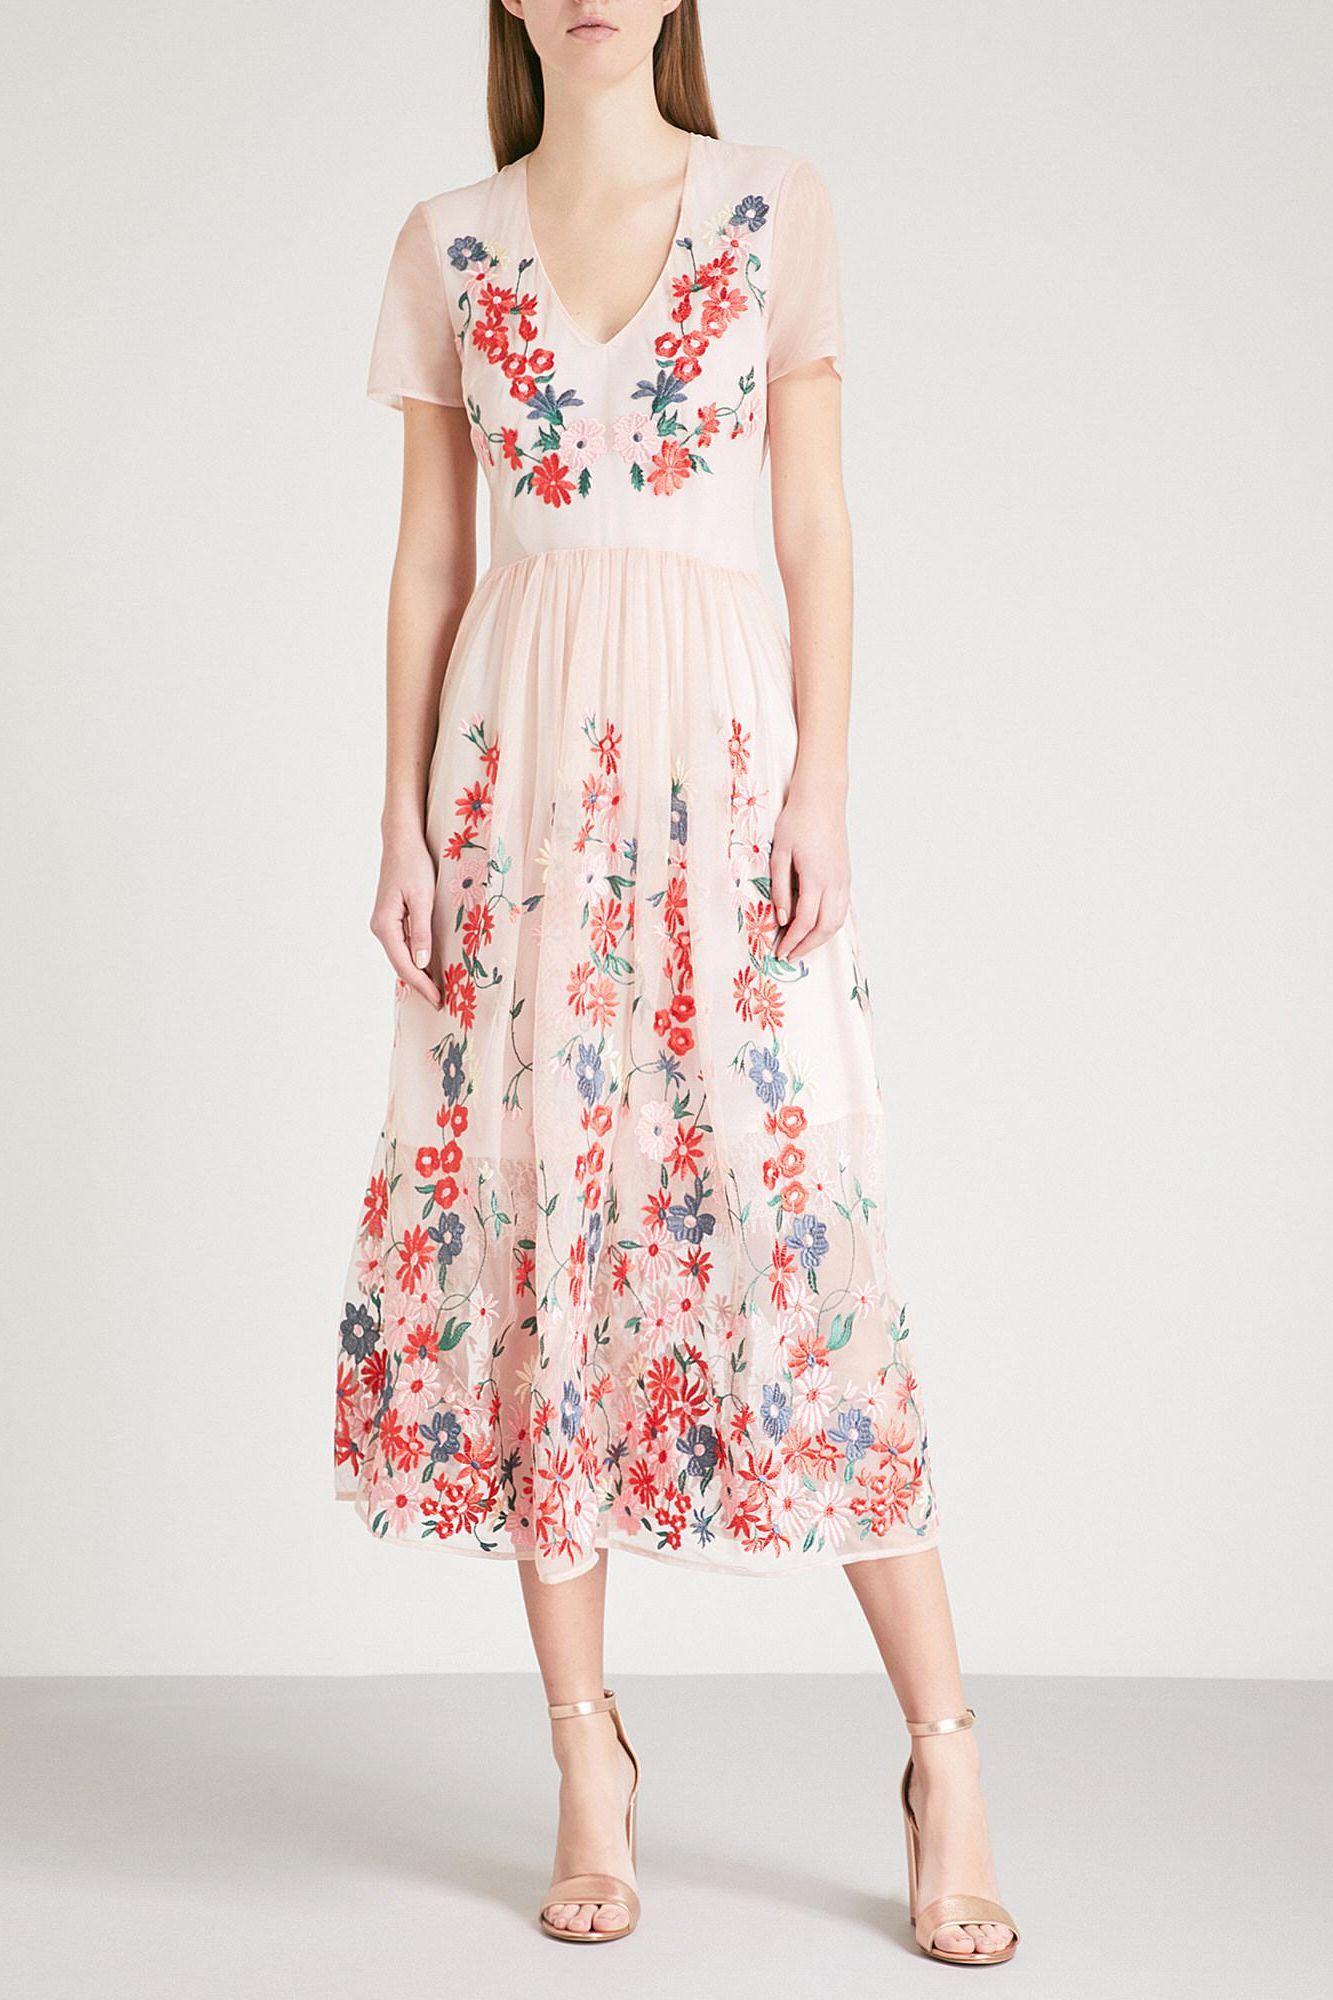 Maje Raphael Floral Dress 2 Preview Images